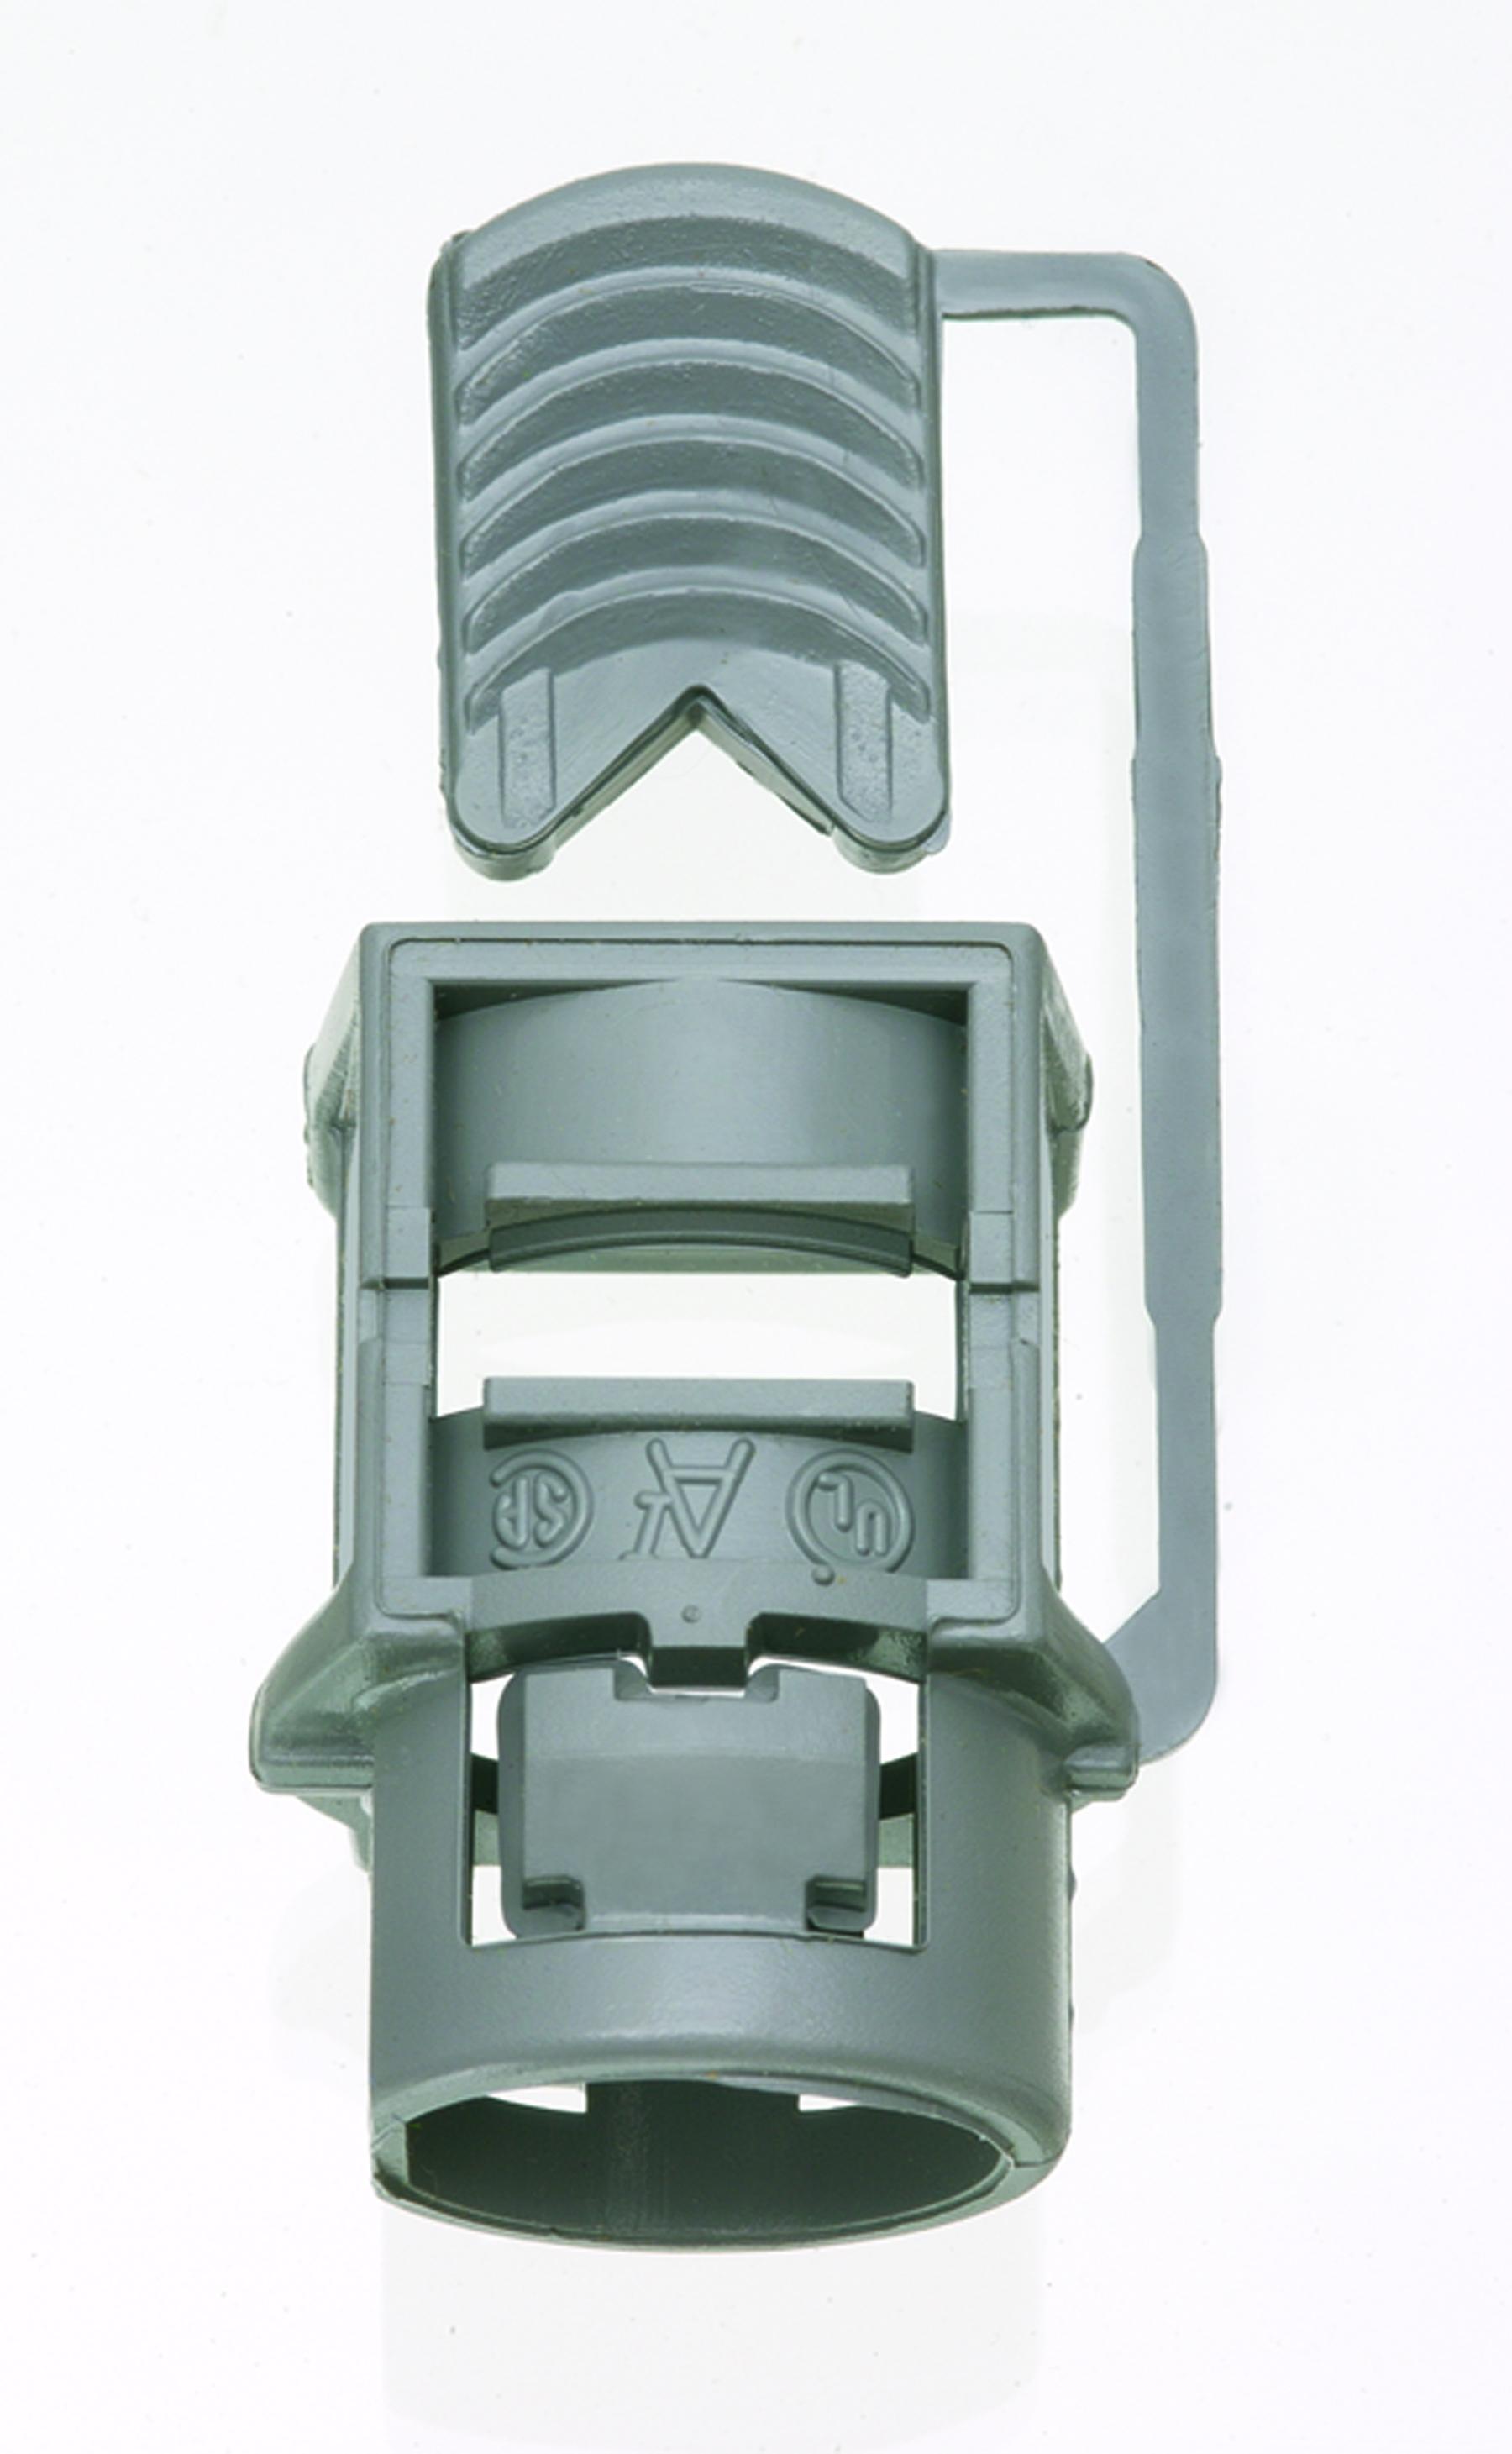 Arlington Nm841 Product Information